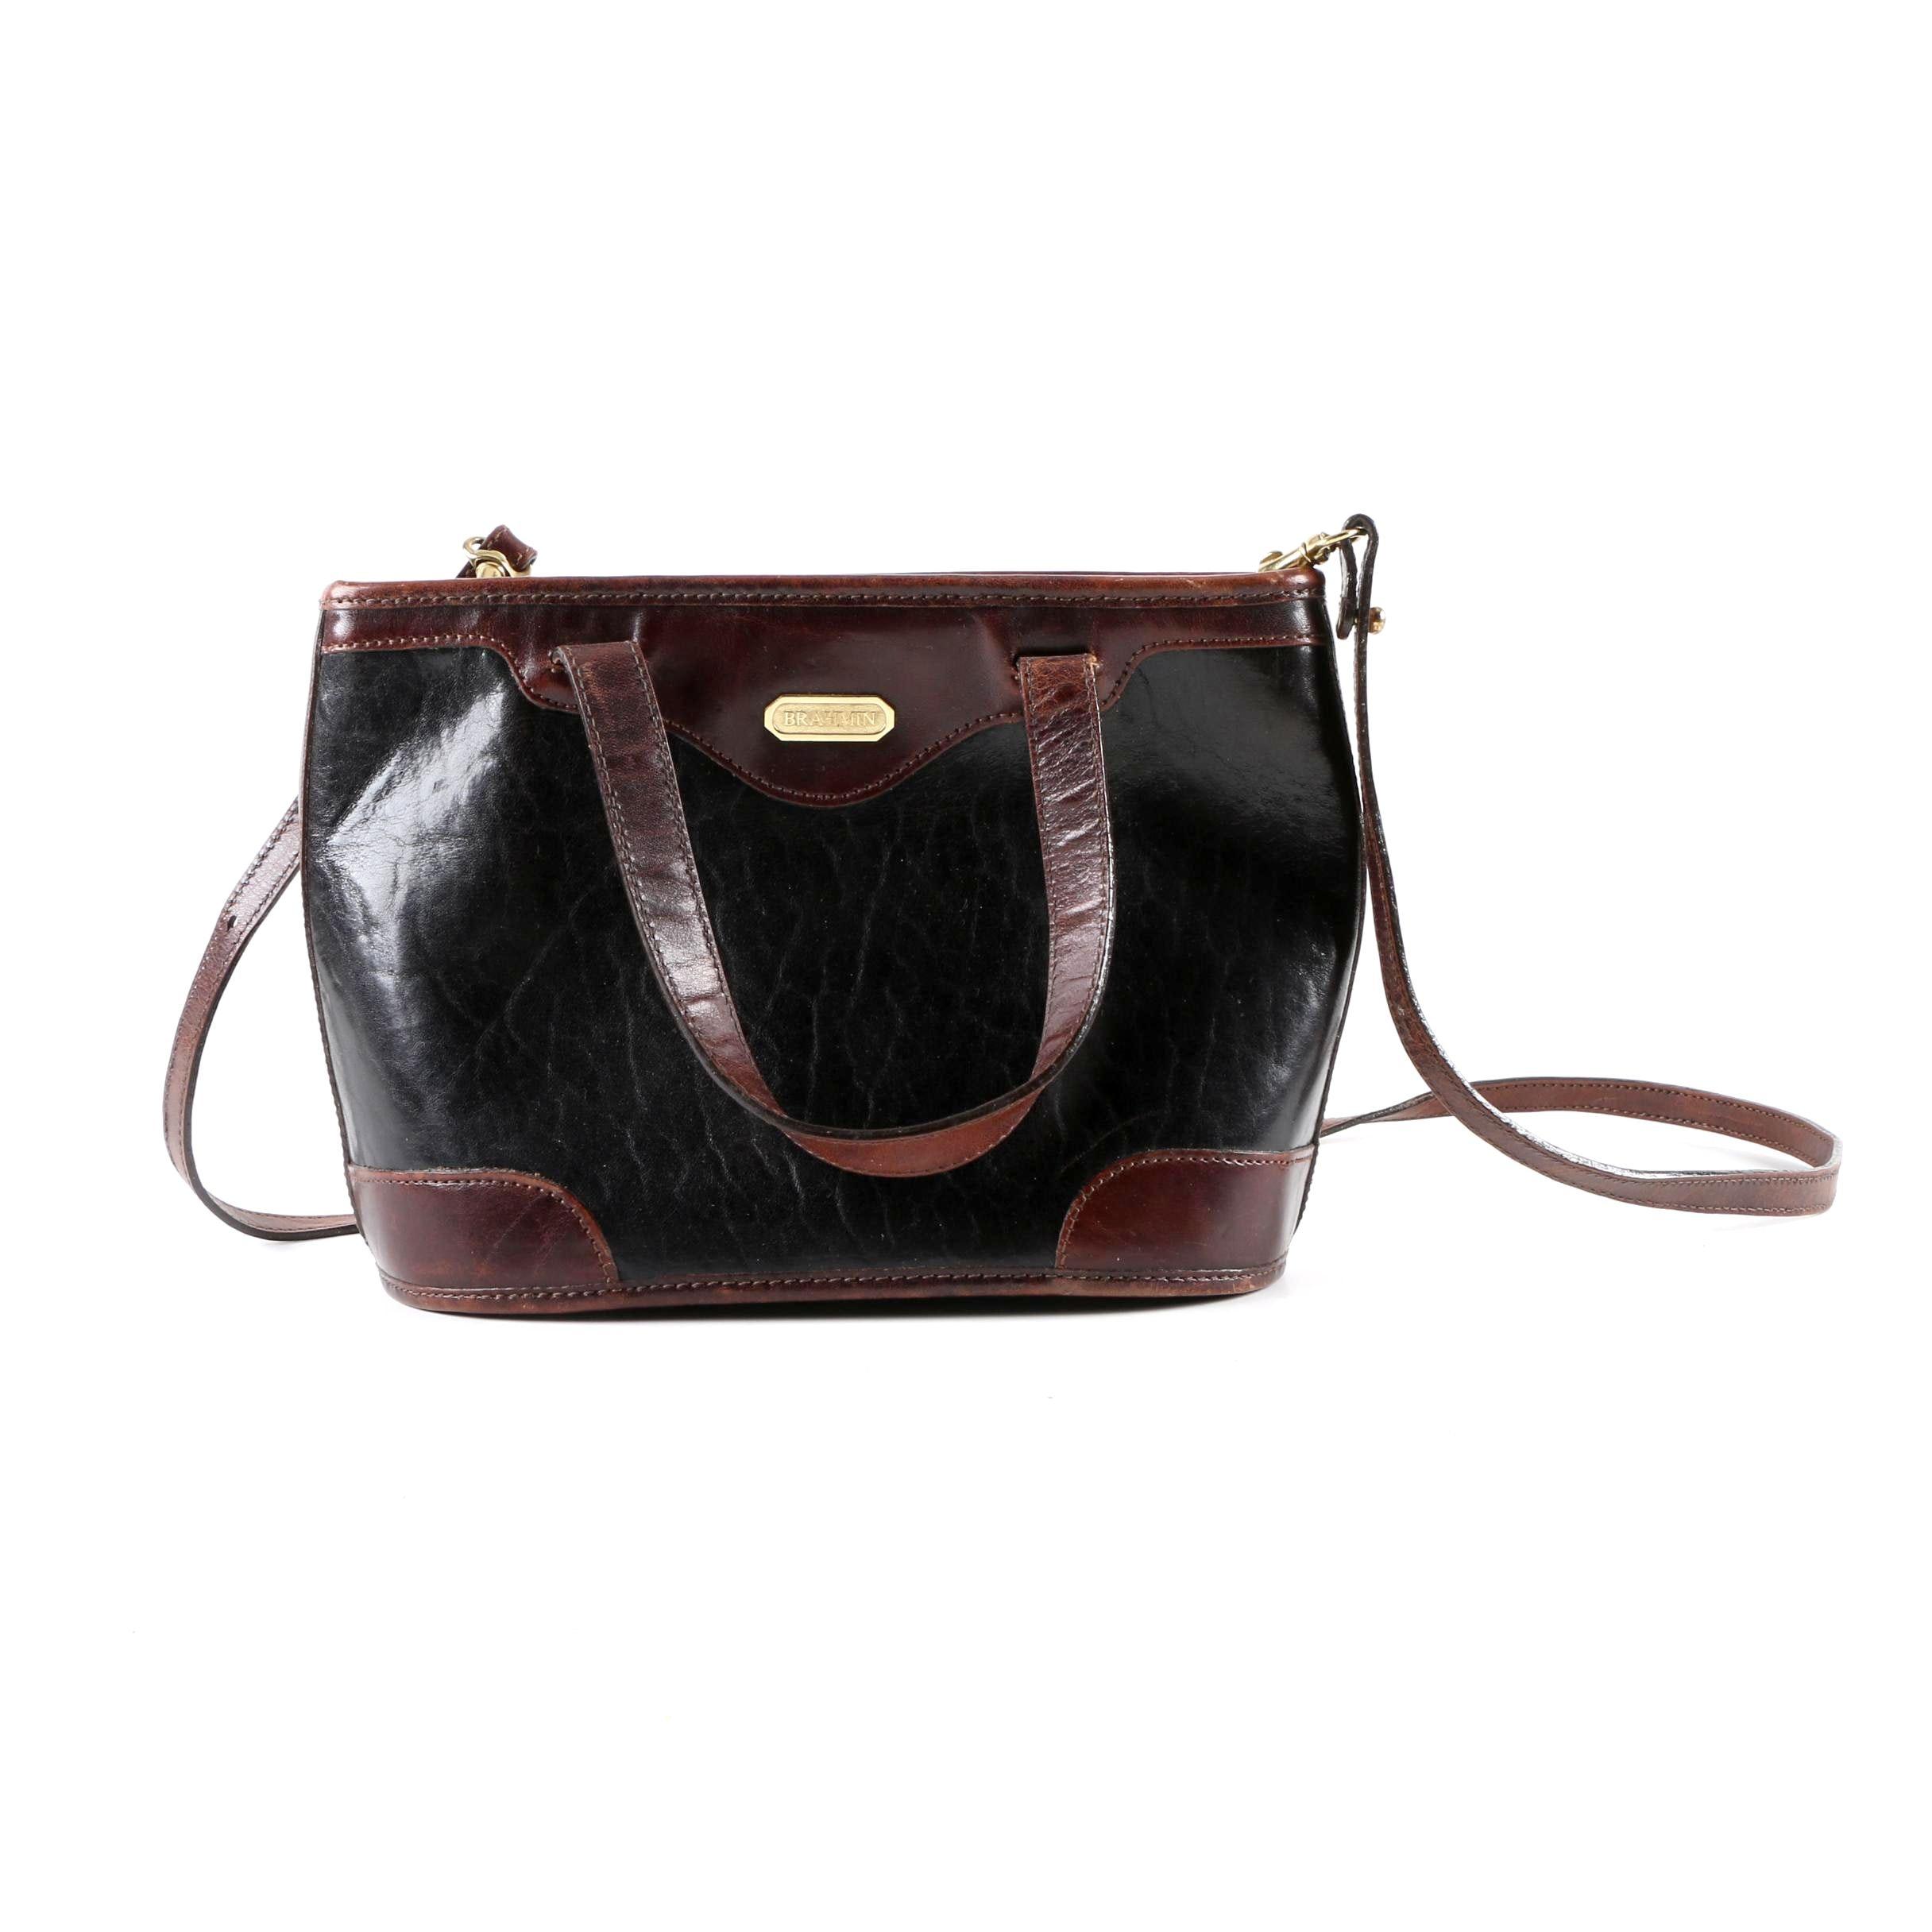 Brahmin Black and Brown Leather Handbag